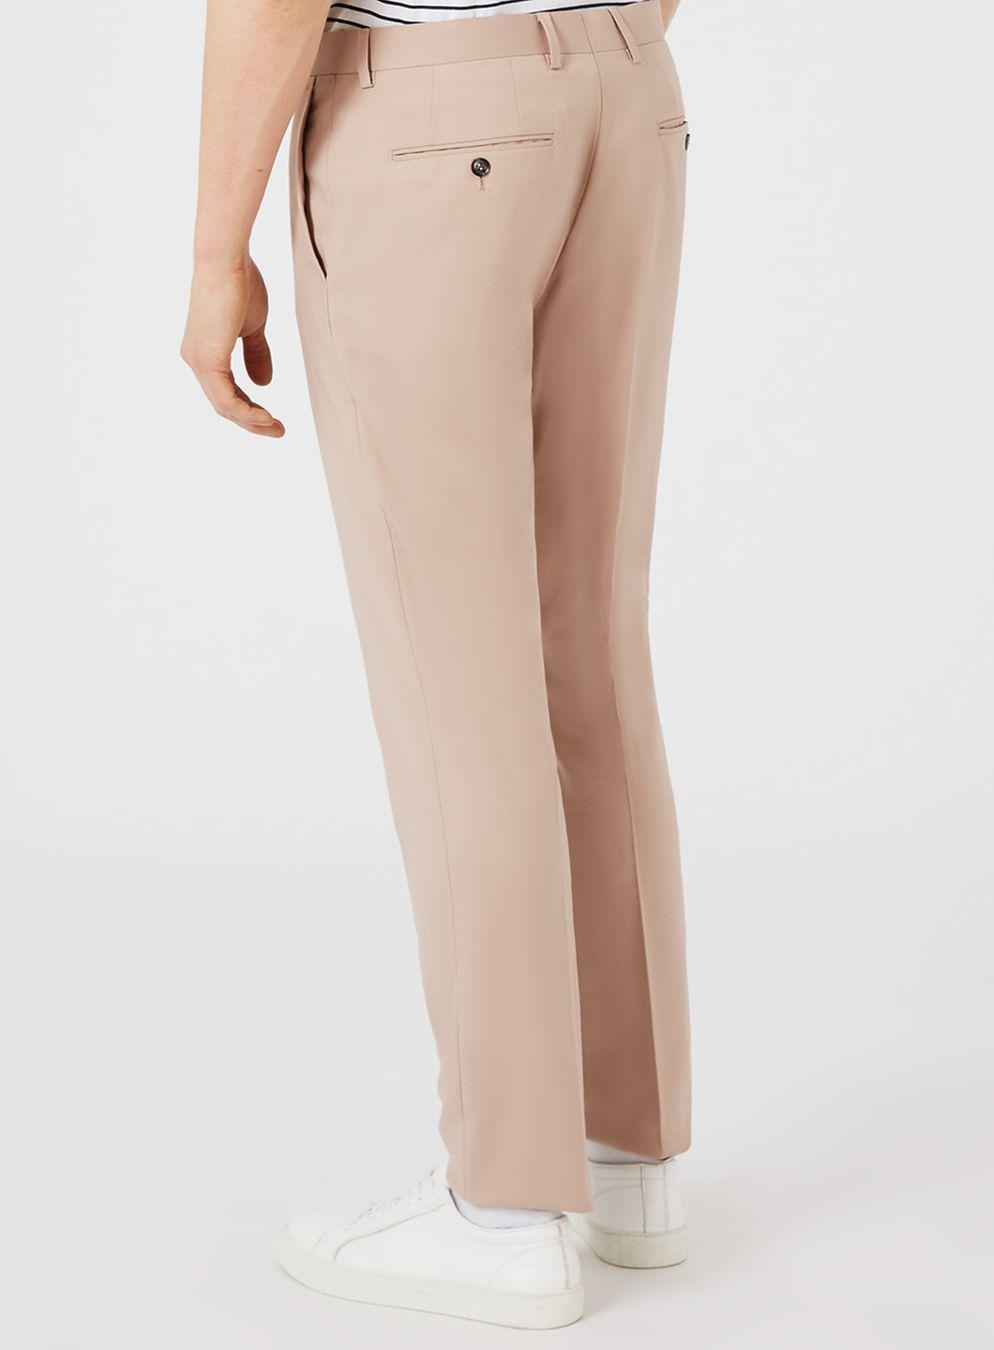 TOPMAN Synthetic Dusty Rose Skinny Trousers in Pink for Men